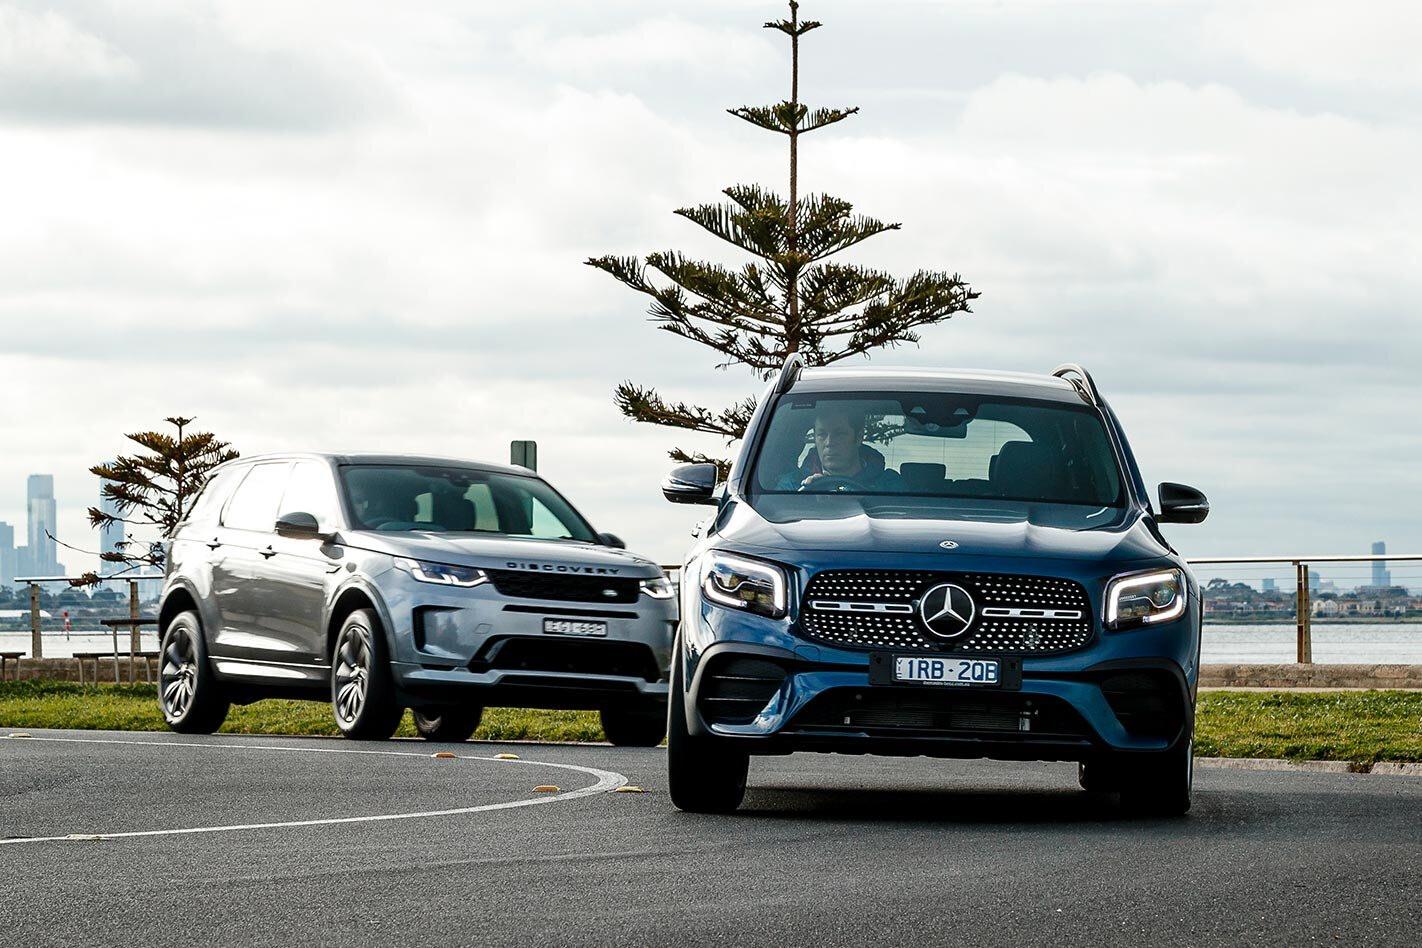 Mercedes Benz Vs Land Rover Discovery 5 Jpg